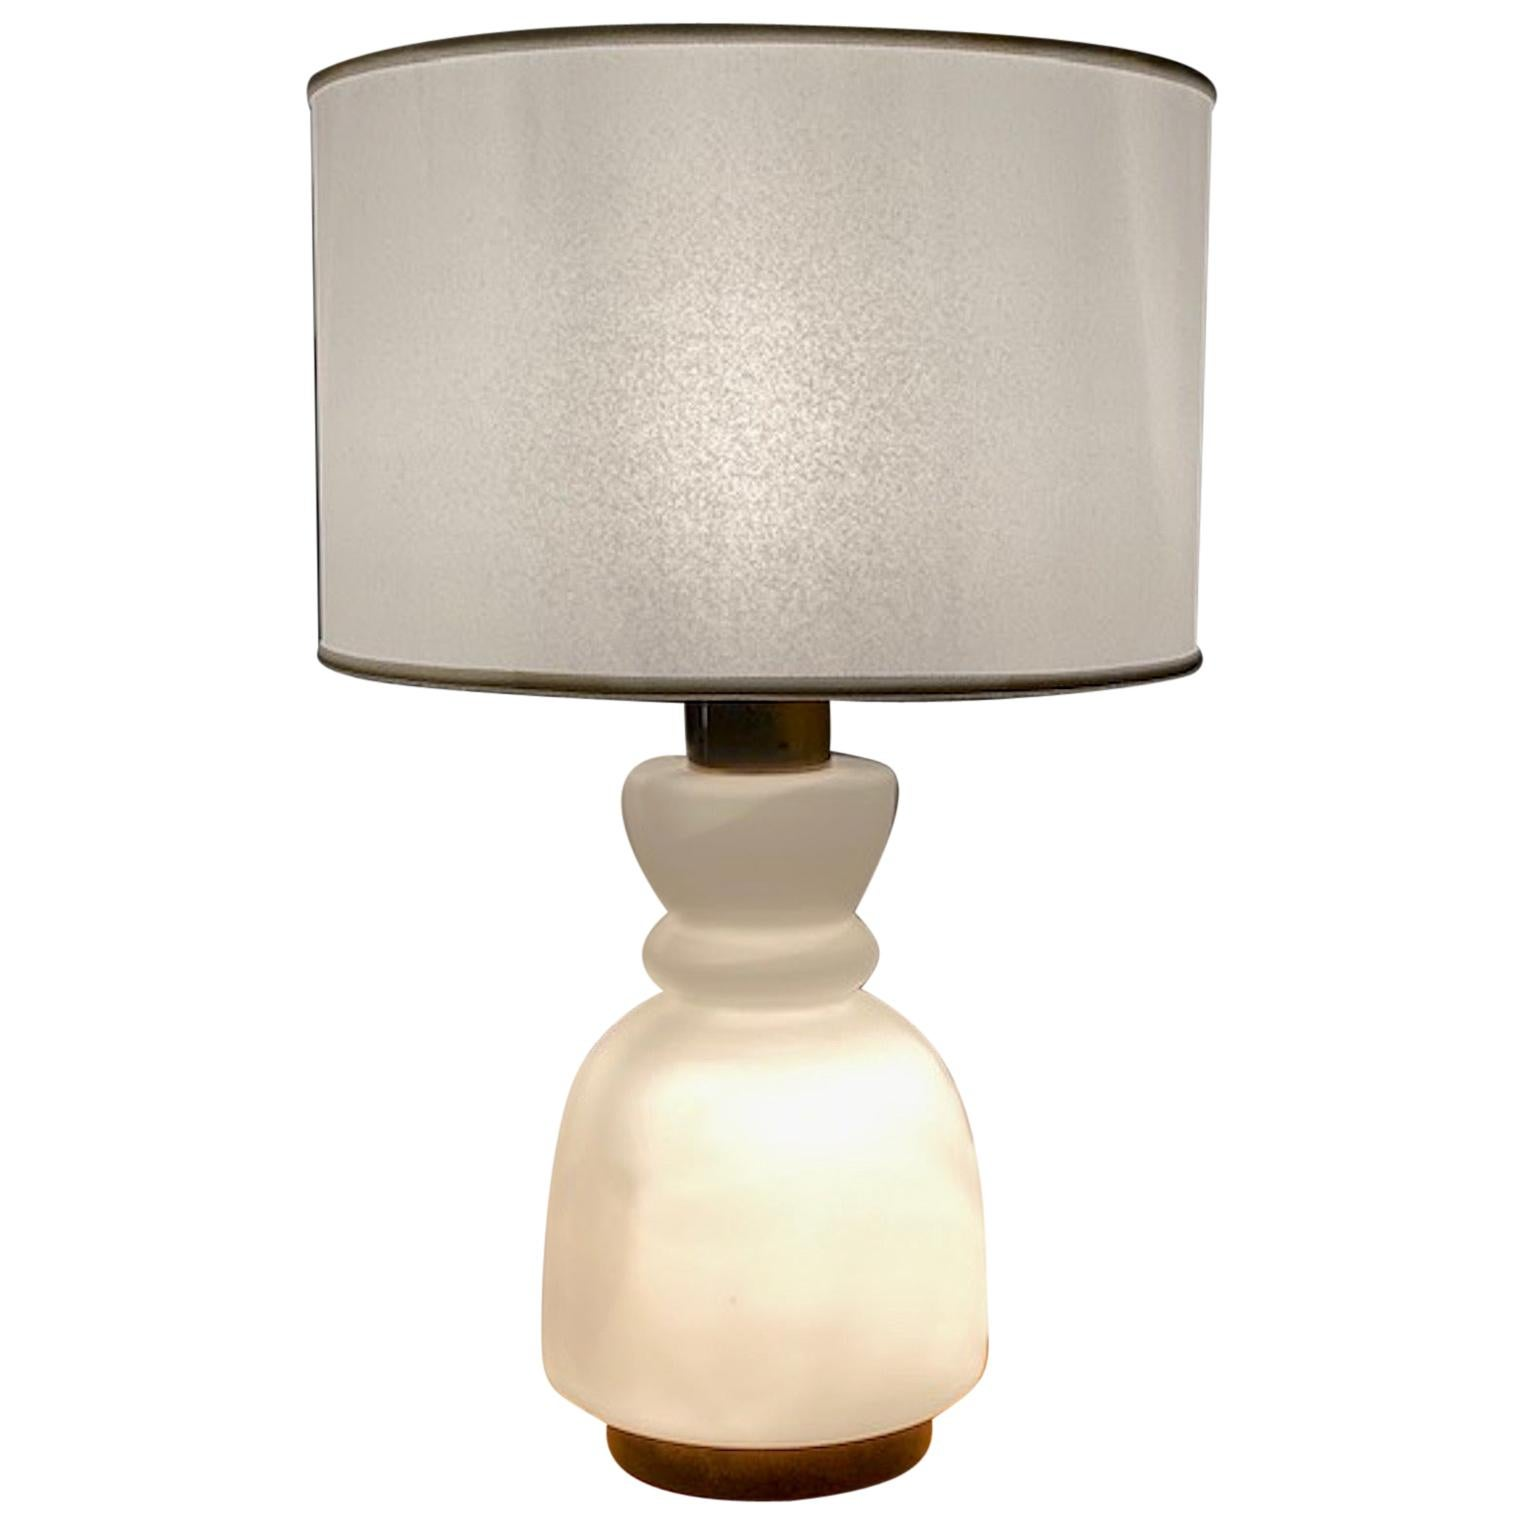 Stilnovo Cased Glass and Brass Table Lamp